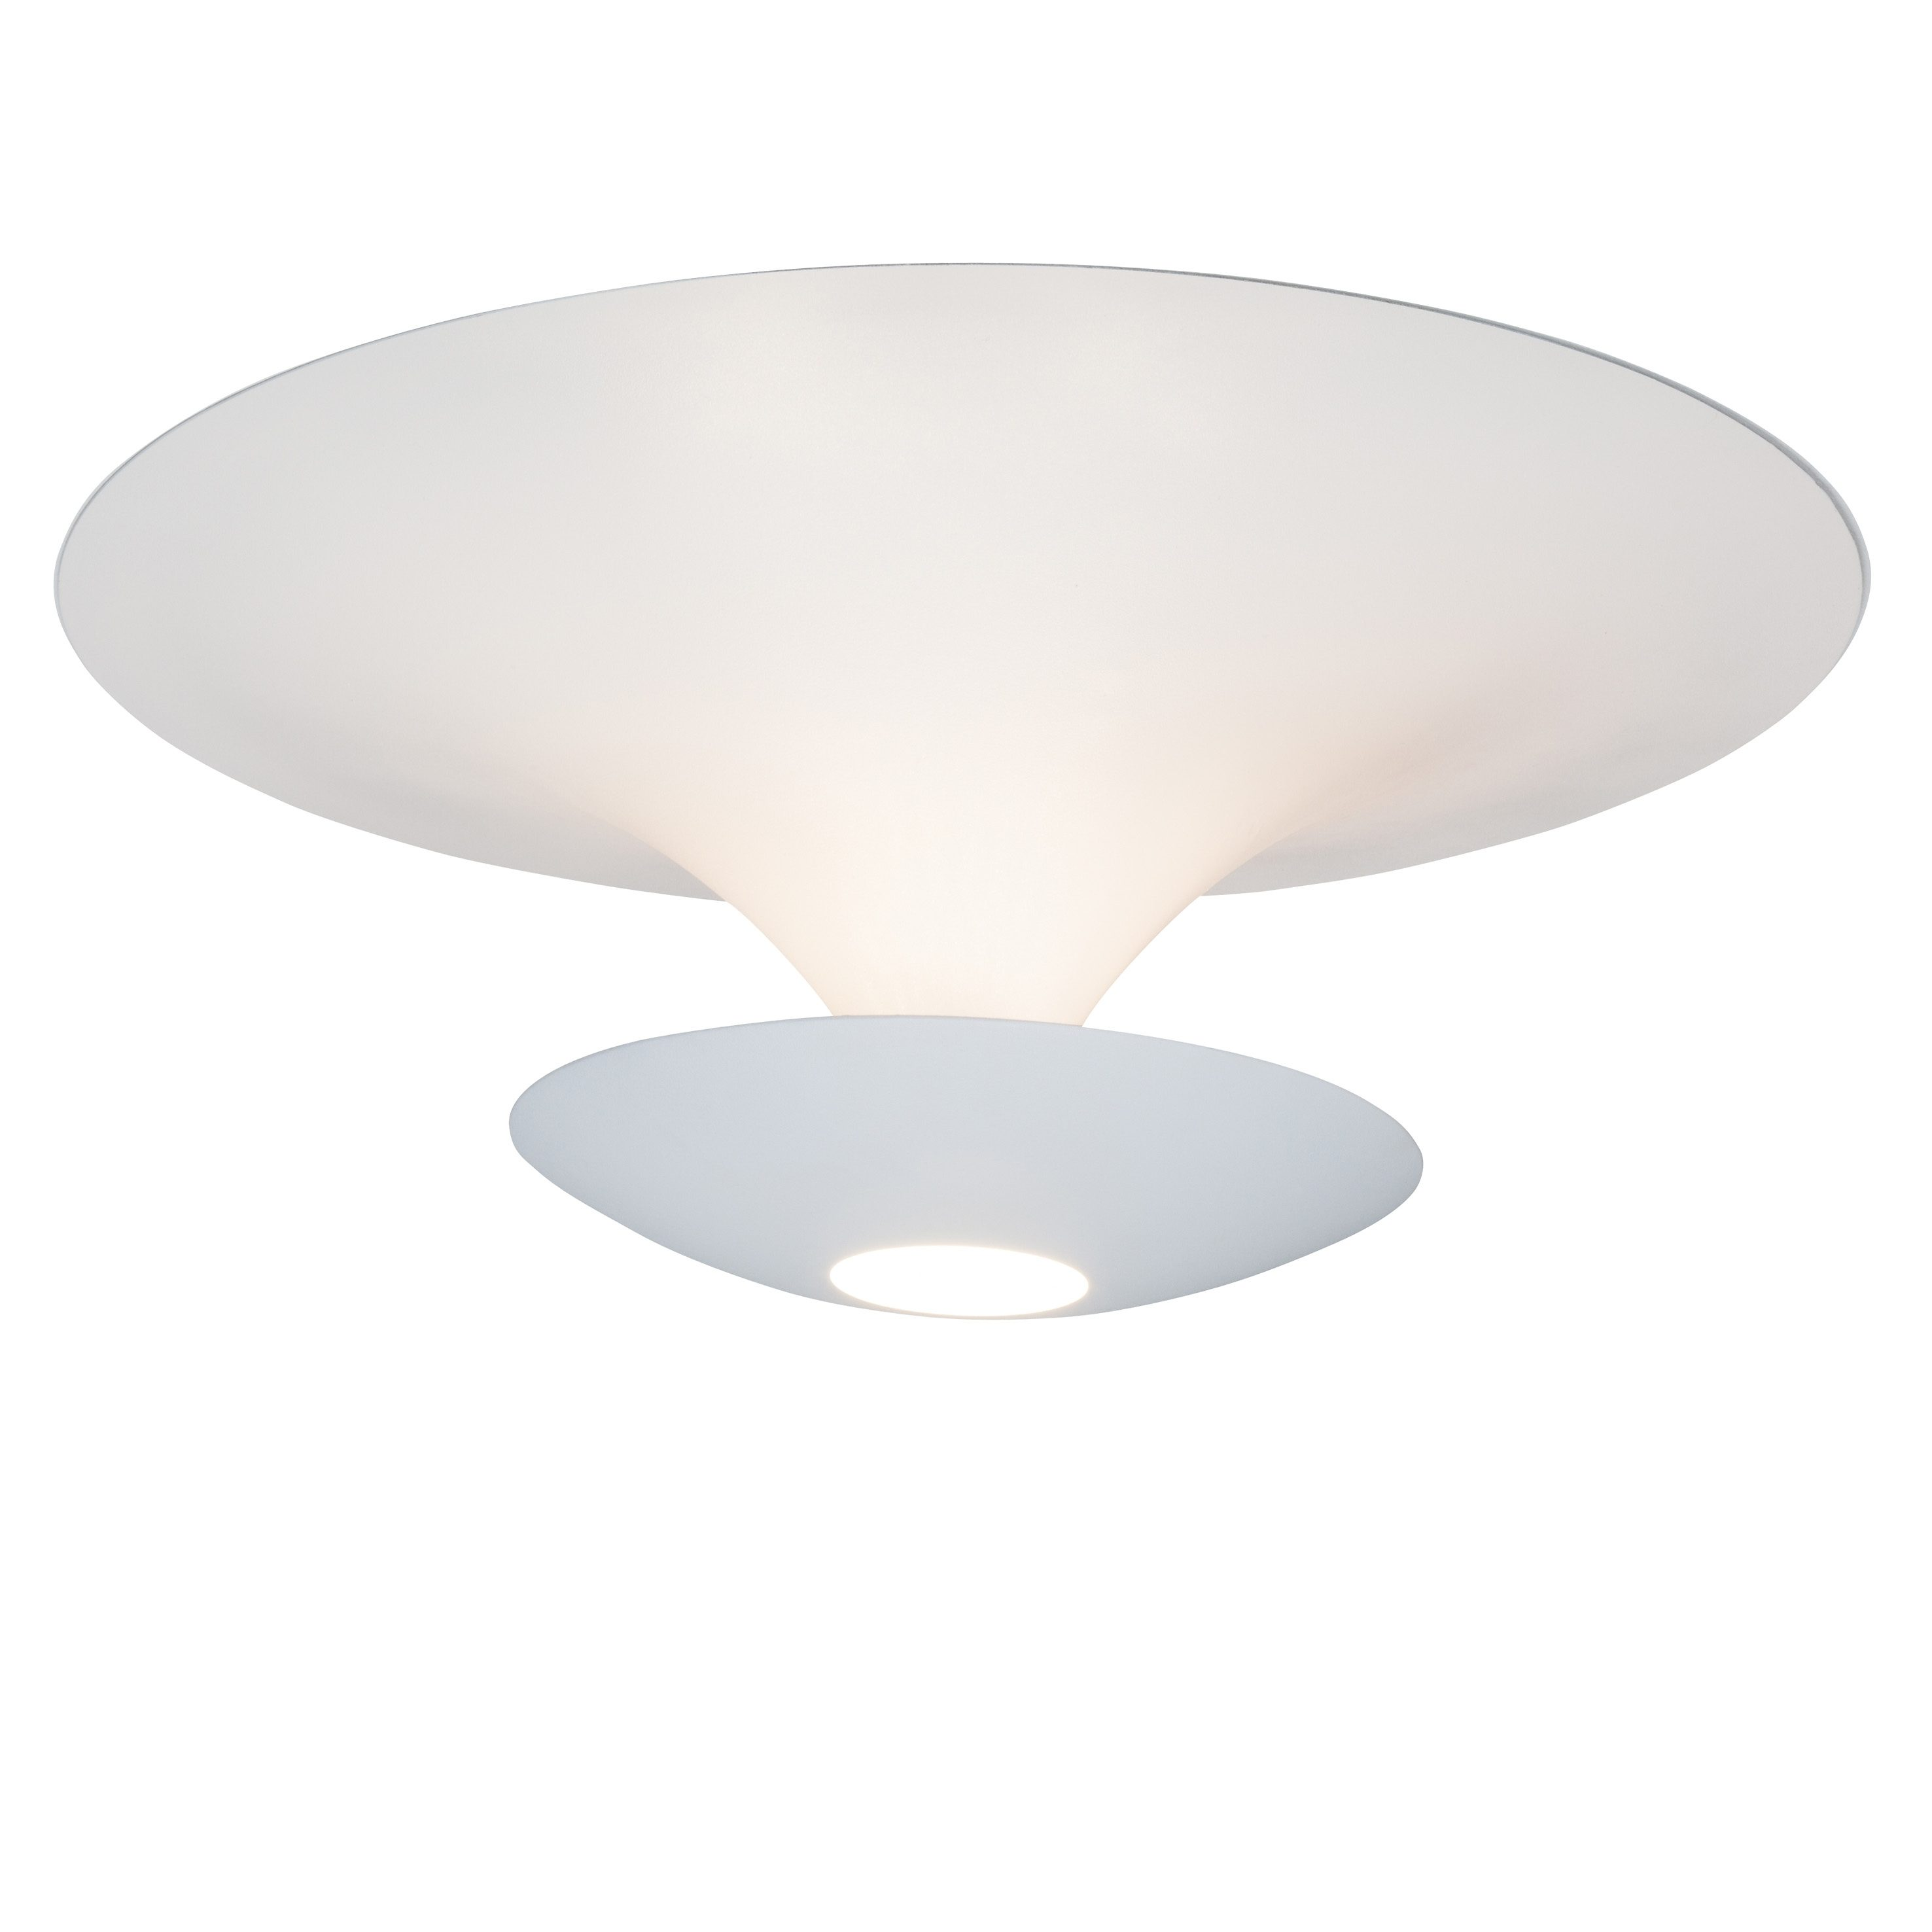 Brilliant Leuchten LED-Deckenleuchte, inkl. LED-Leuchtmittel, 1 flammig